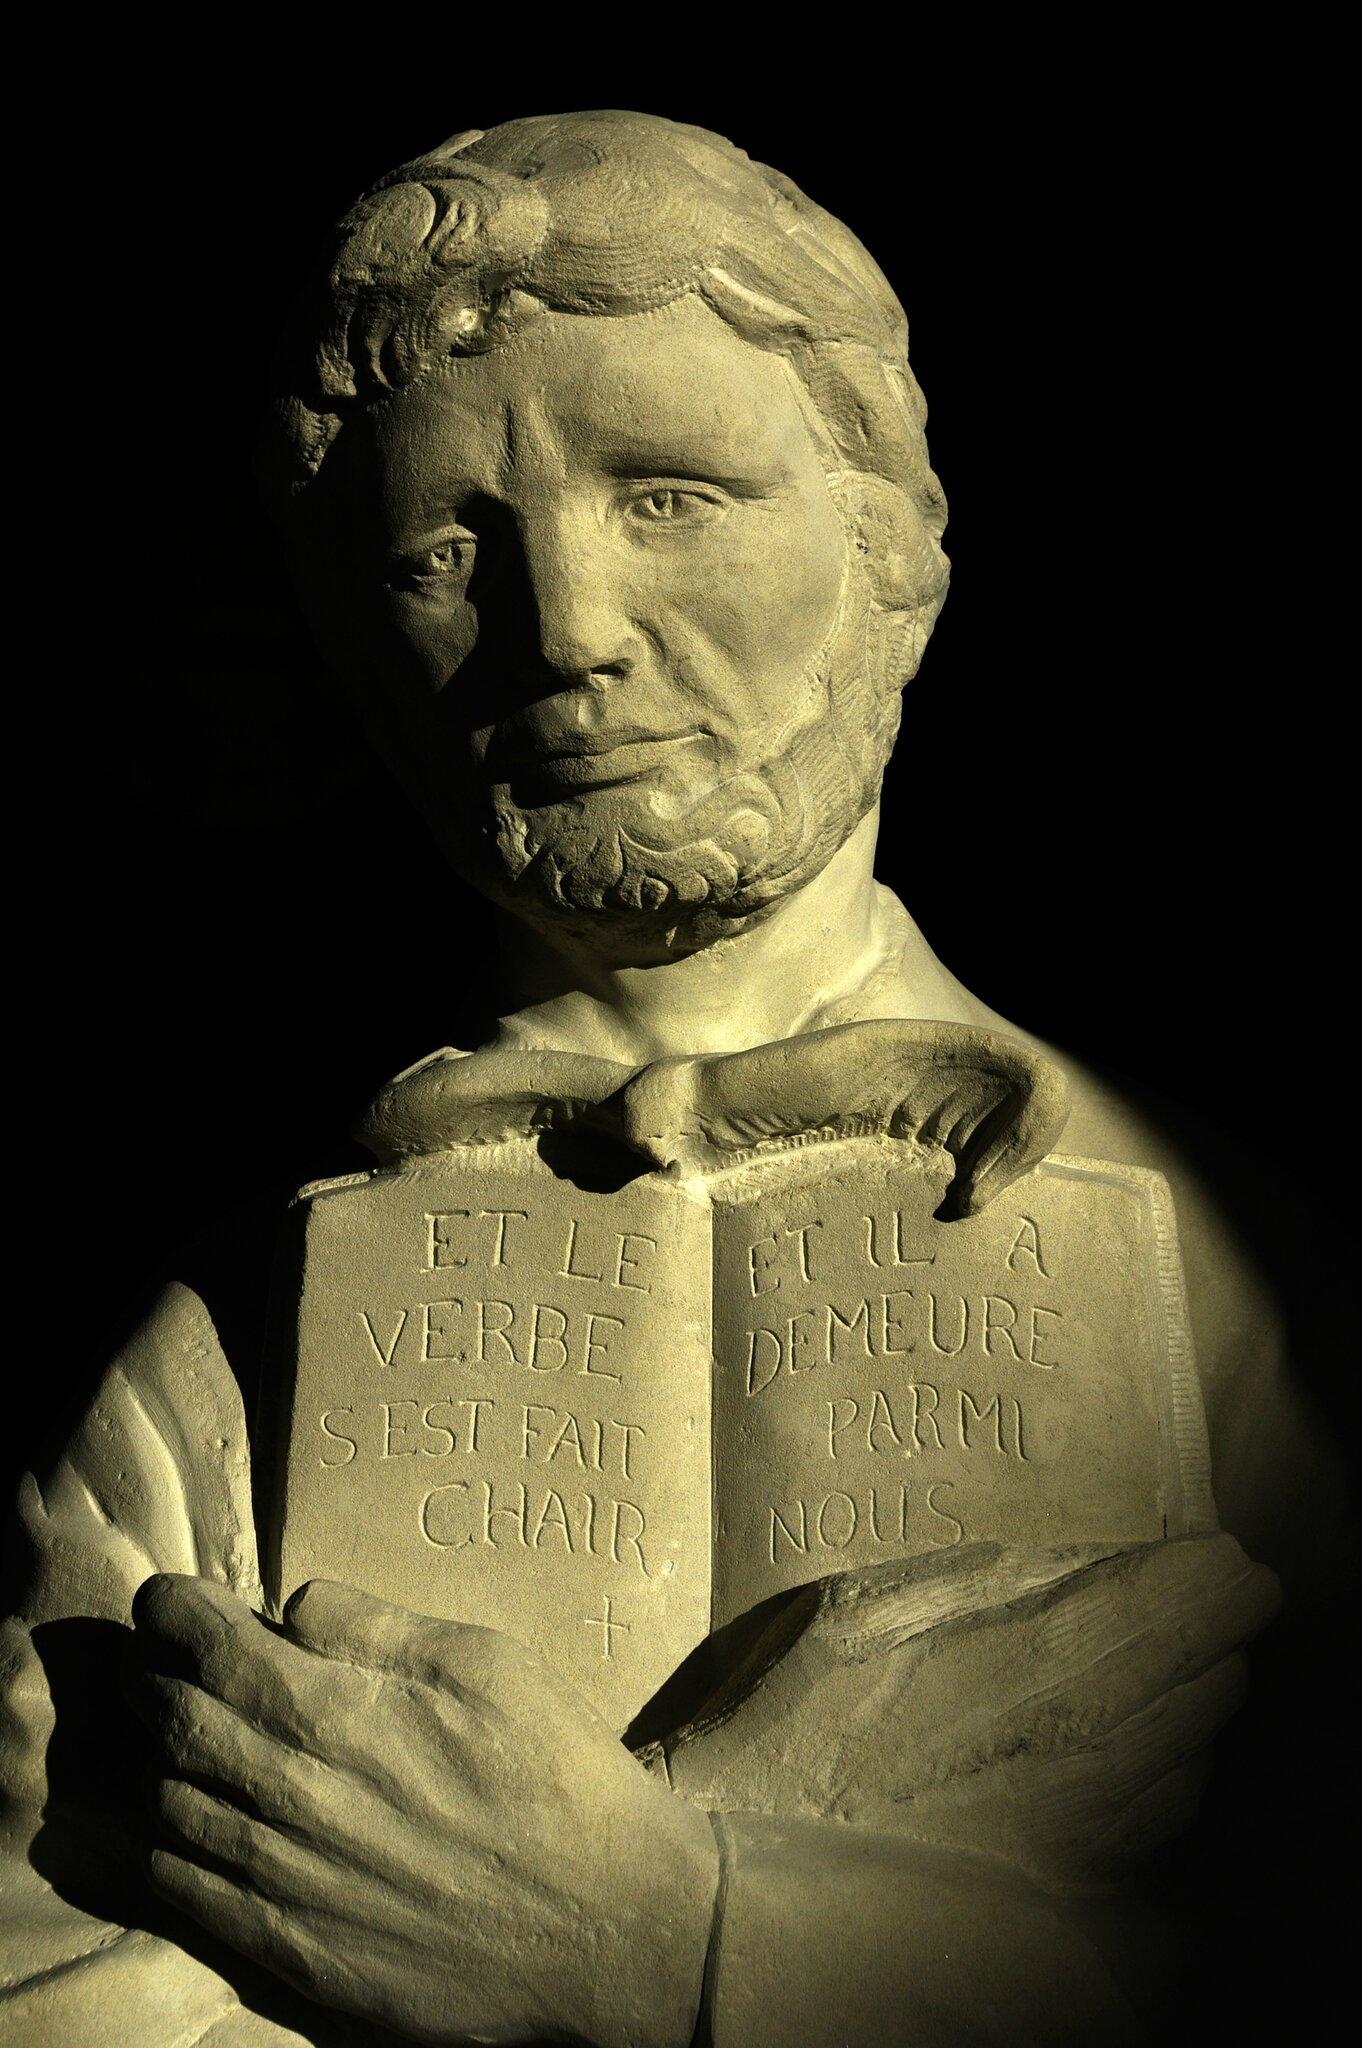 Fulbert DUBOIS sculpteur - Saint Jean - sculpture pierre